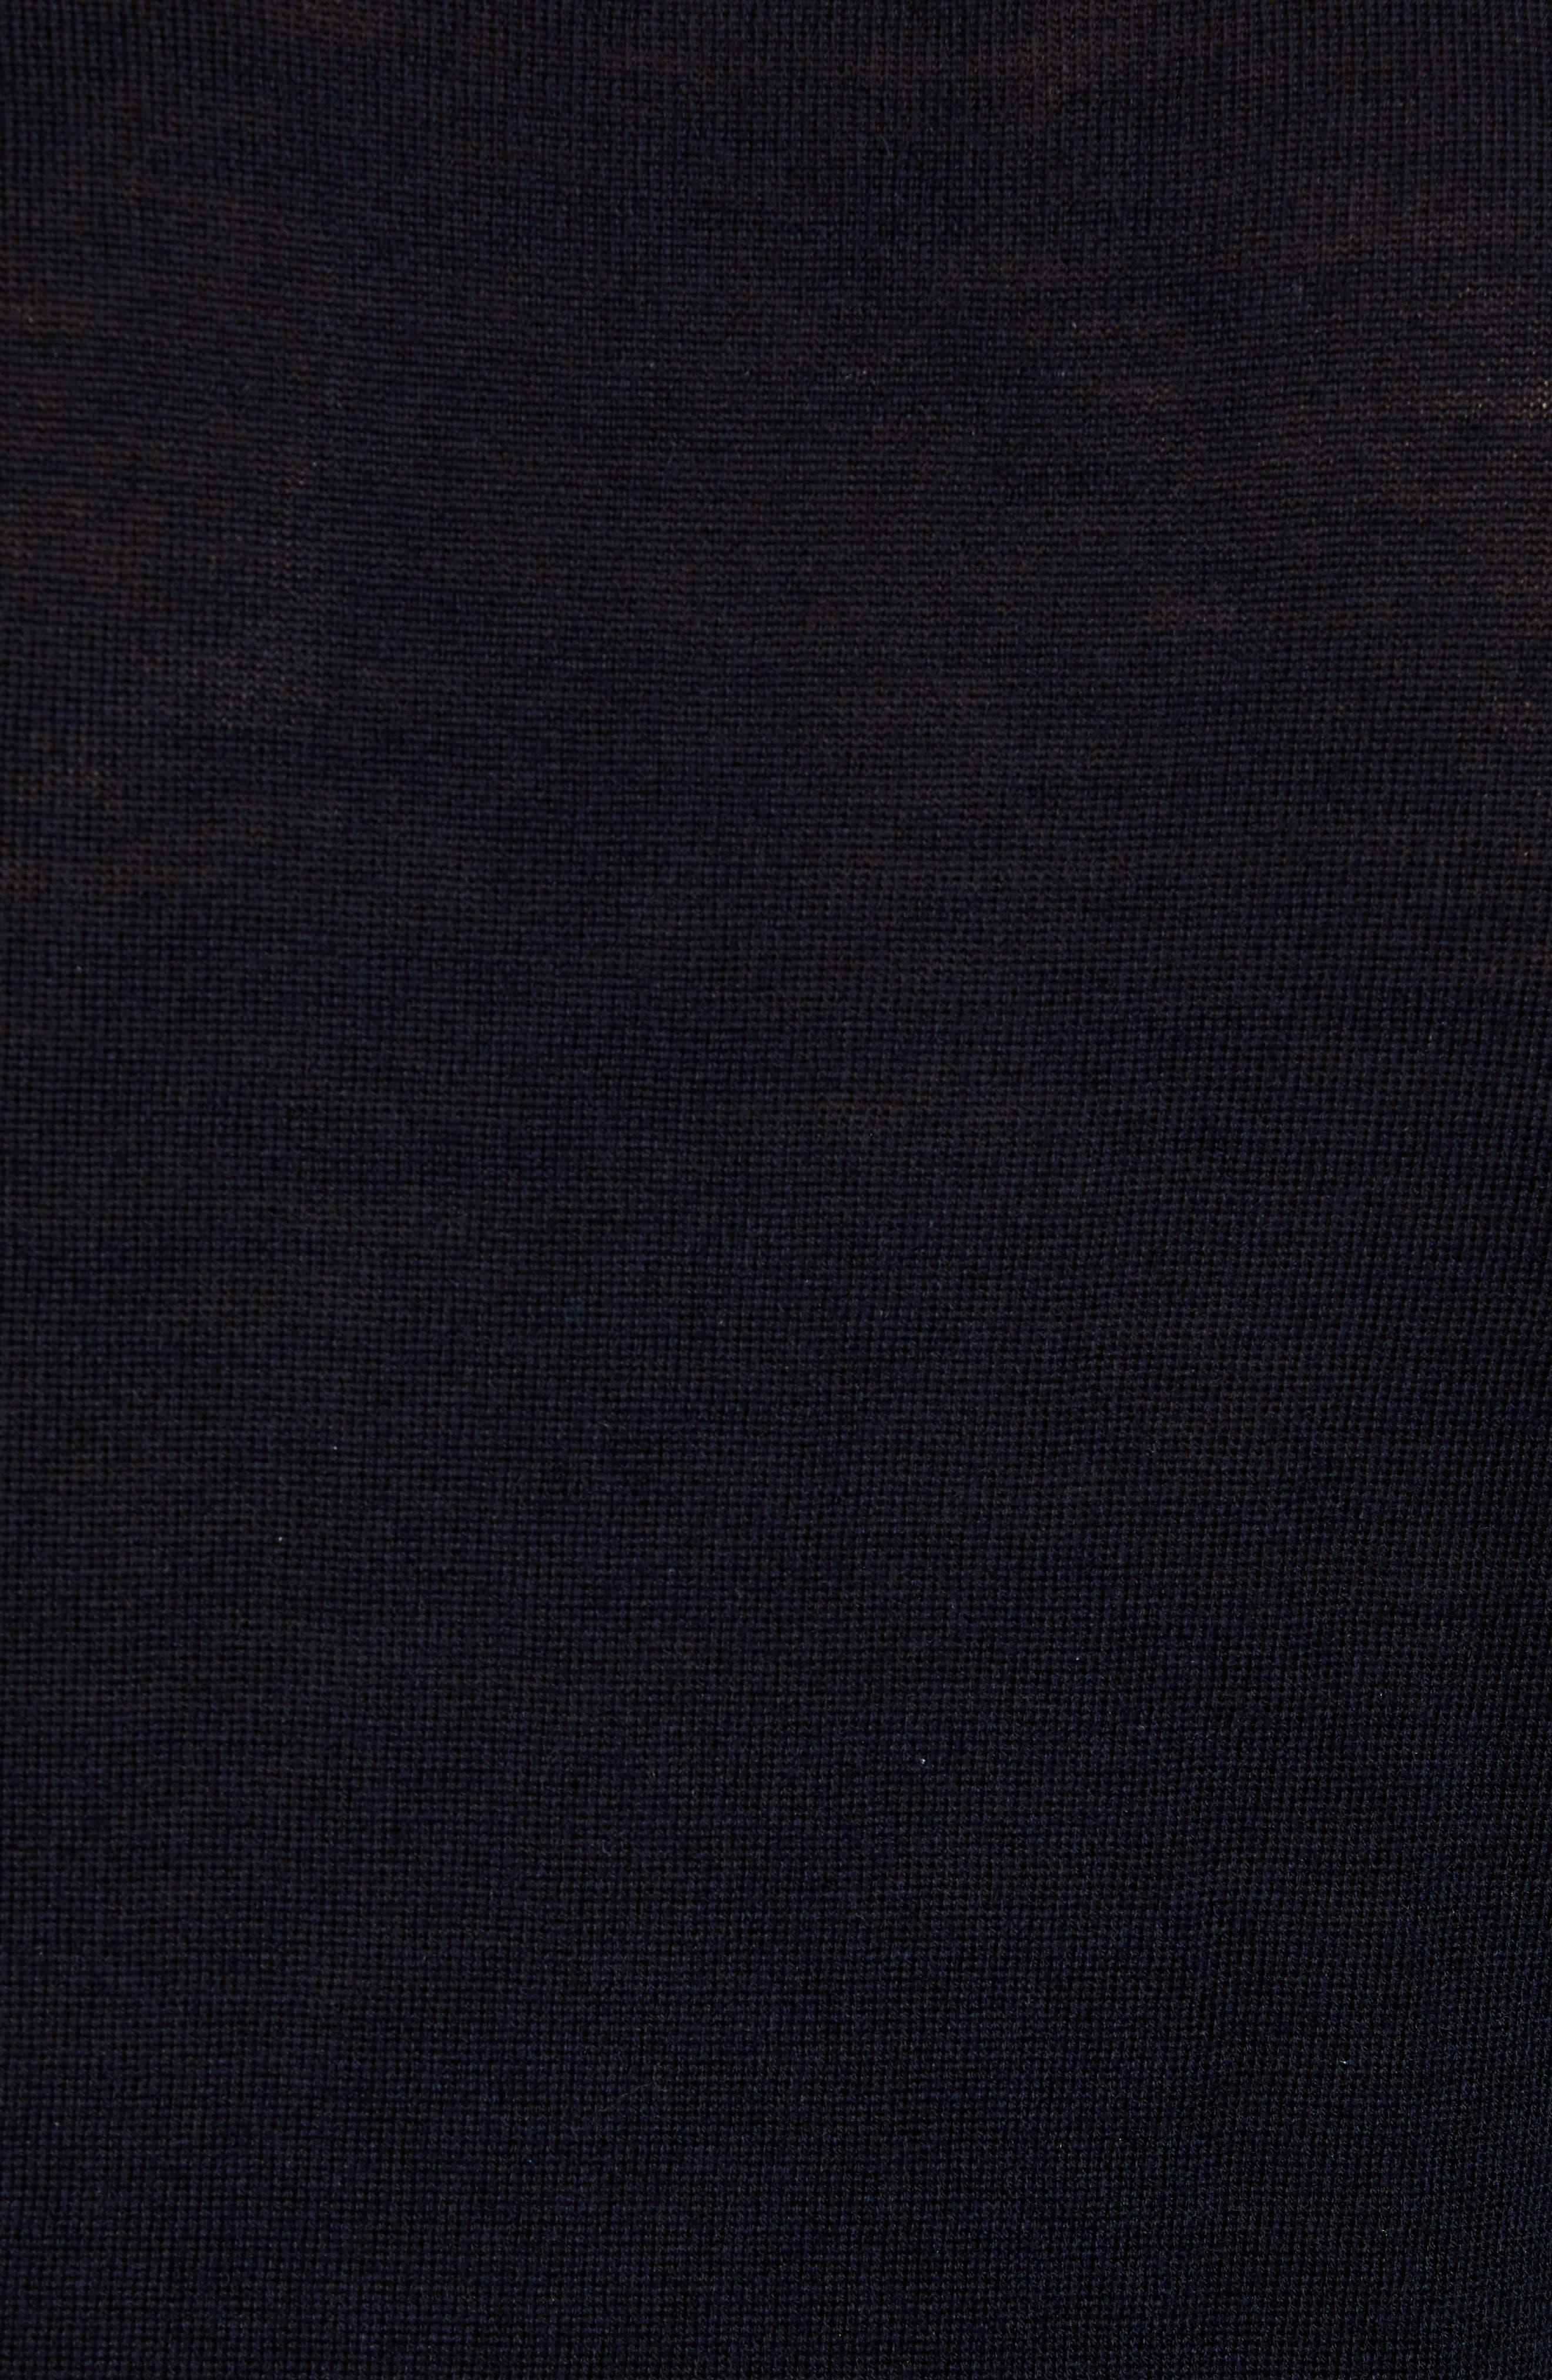 Mode Slim Fit Merino Wool Sweater,                             Alternate thumbnail 30, color,